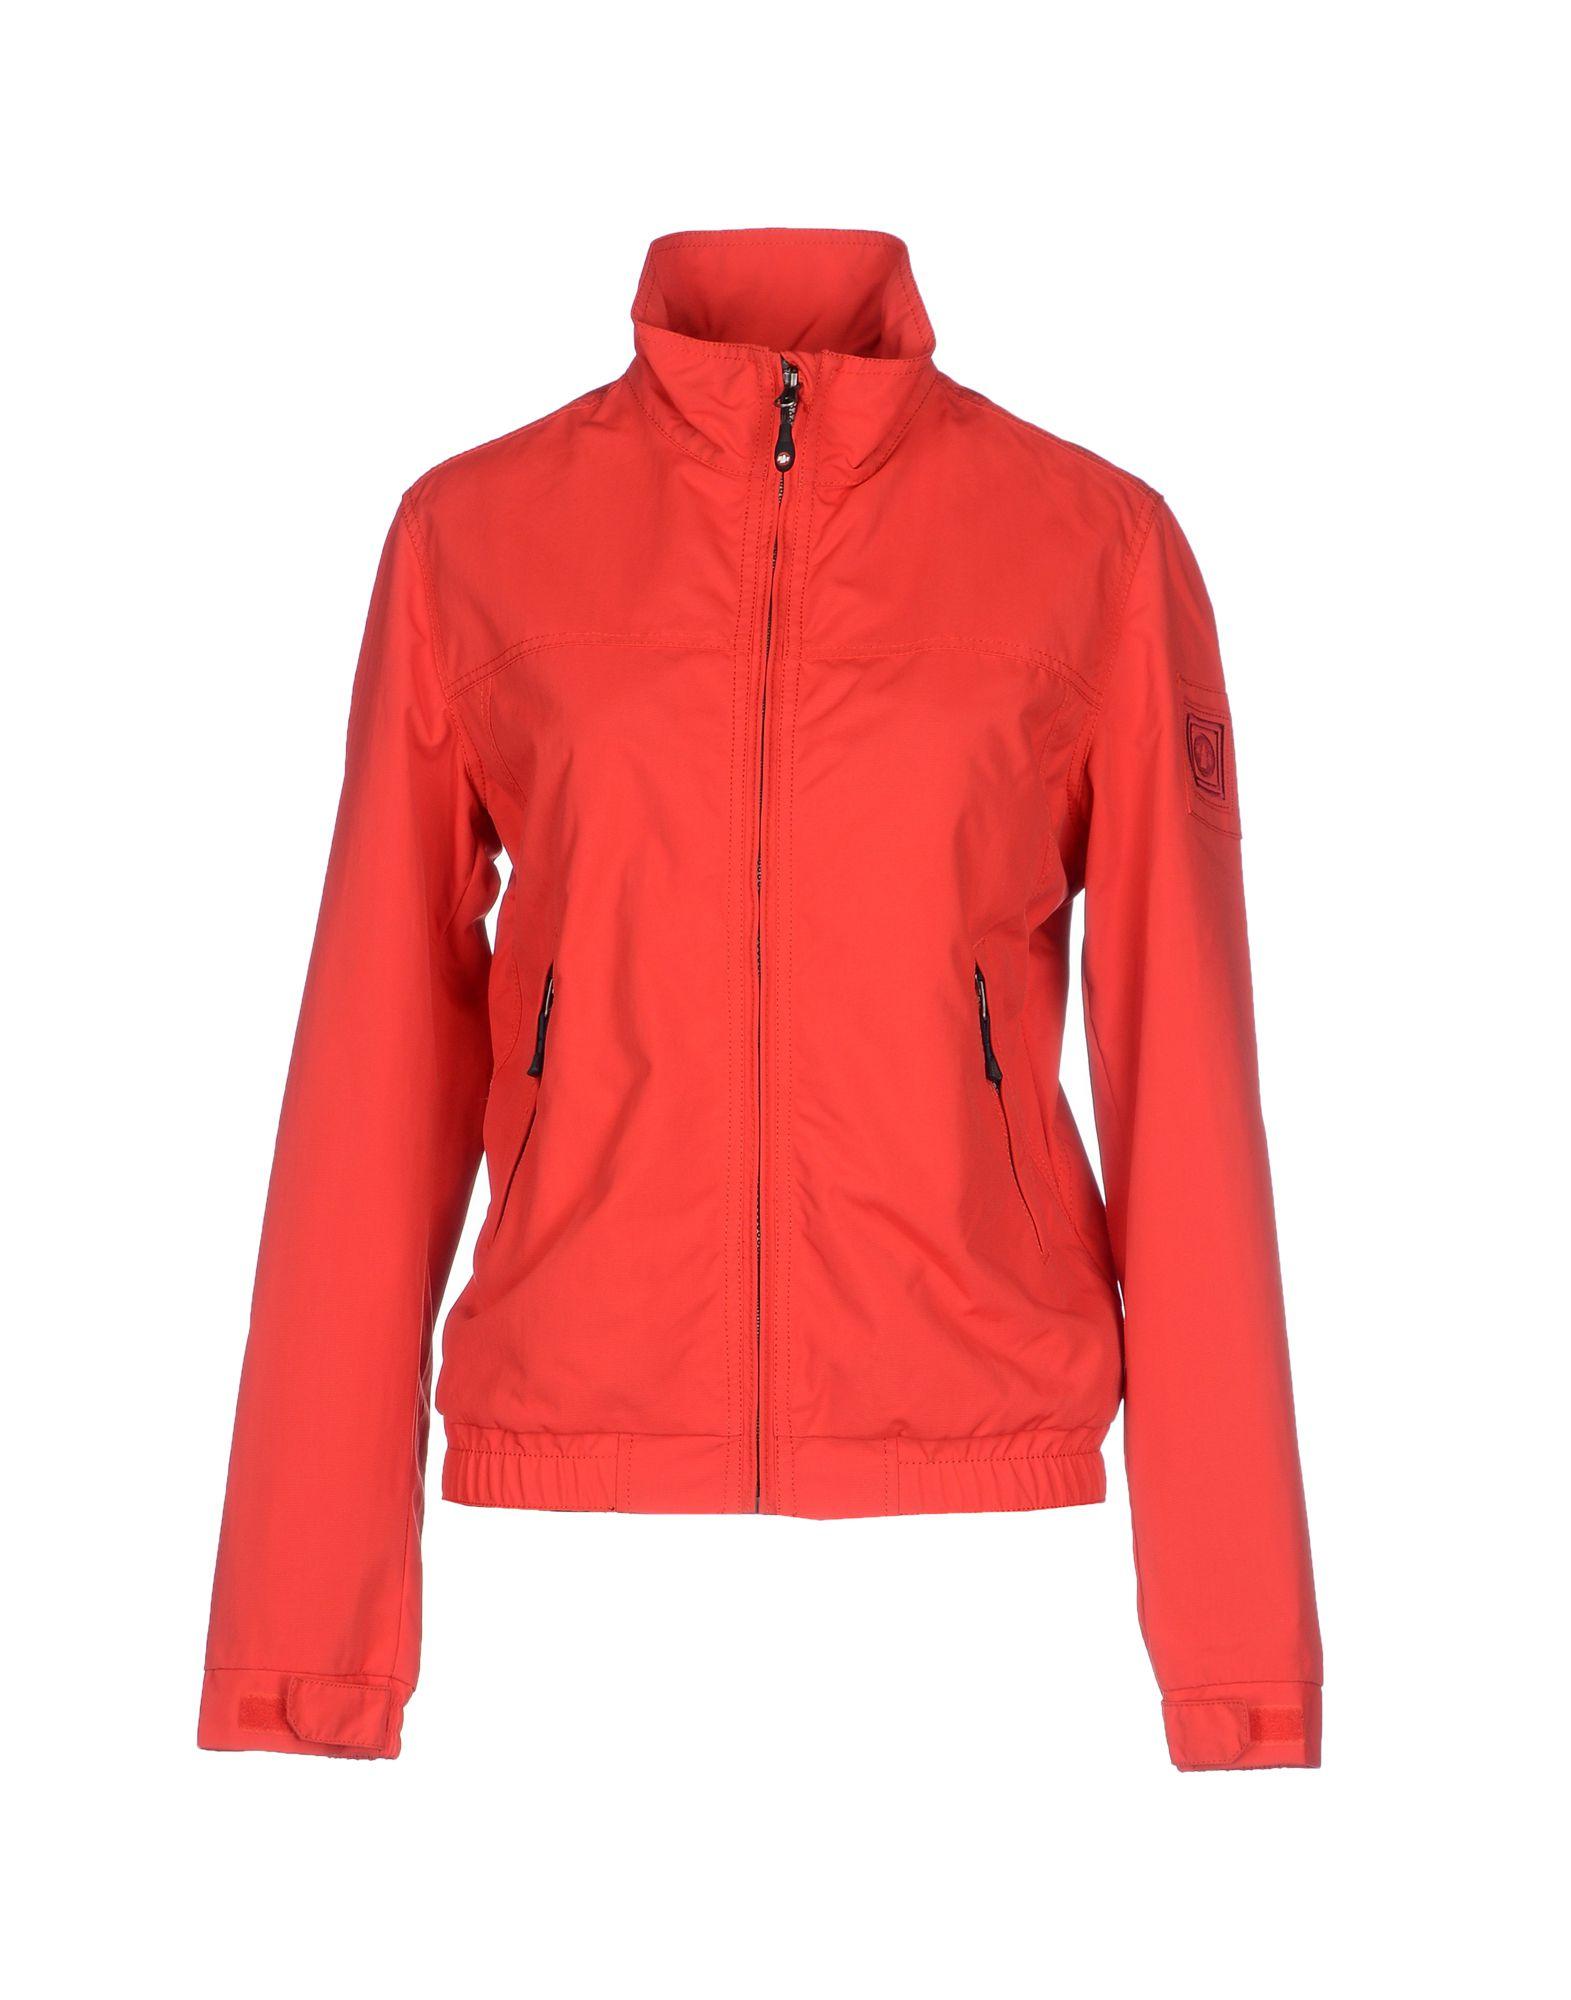 murphy nye jacket in red lyst. Black Bedroom Furniture Sets. Home Design Ideas